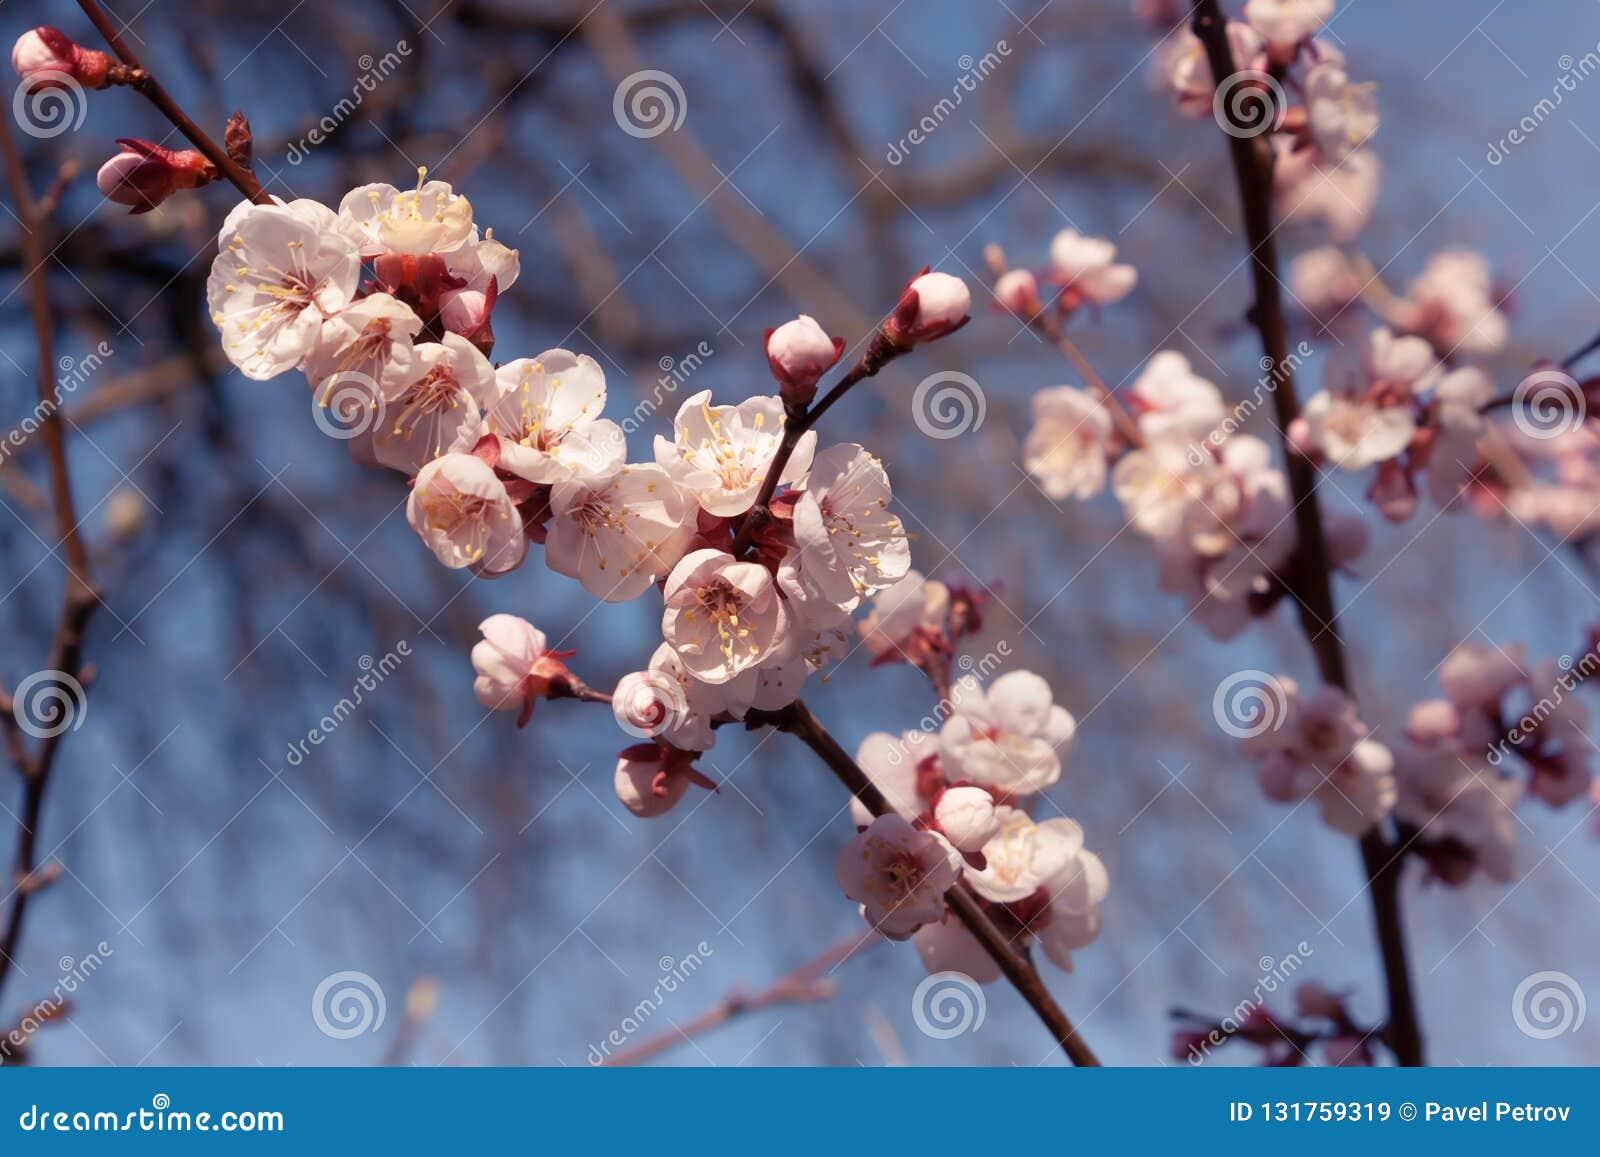 White apricot flowers. Beautiful flowering apricot tree. Blue sky, bokeh